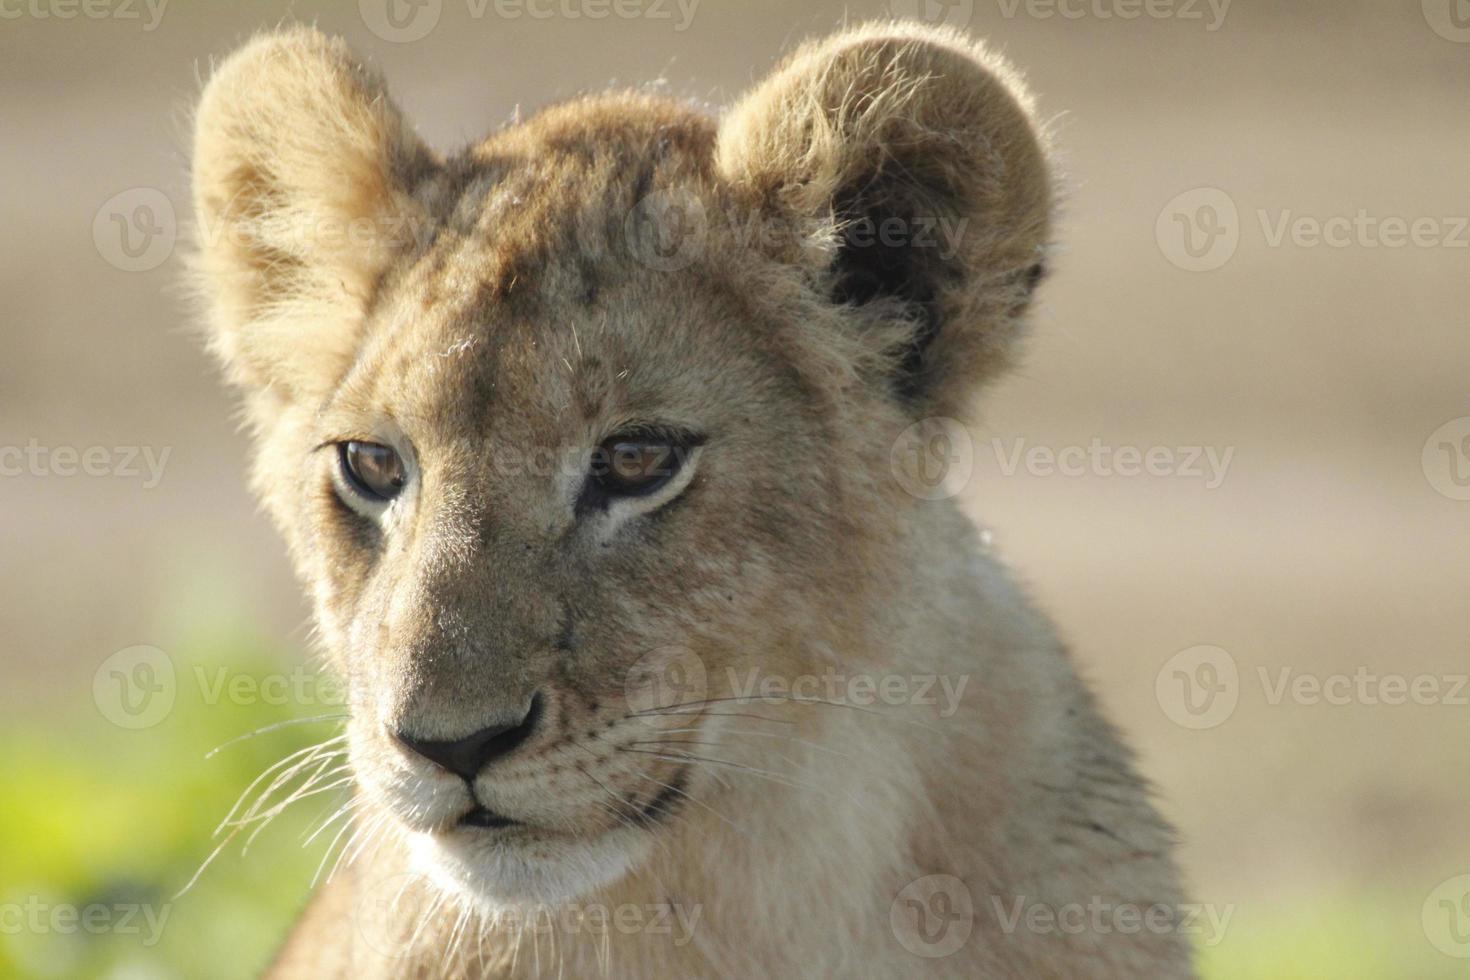 African lion Cub photo